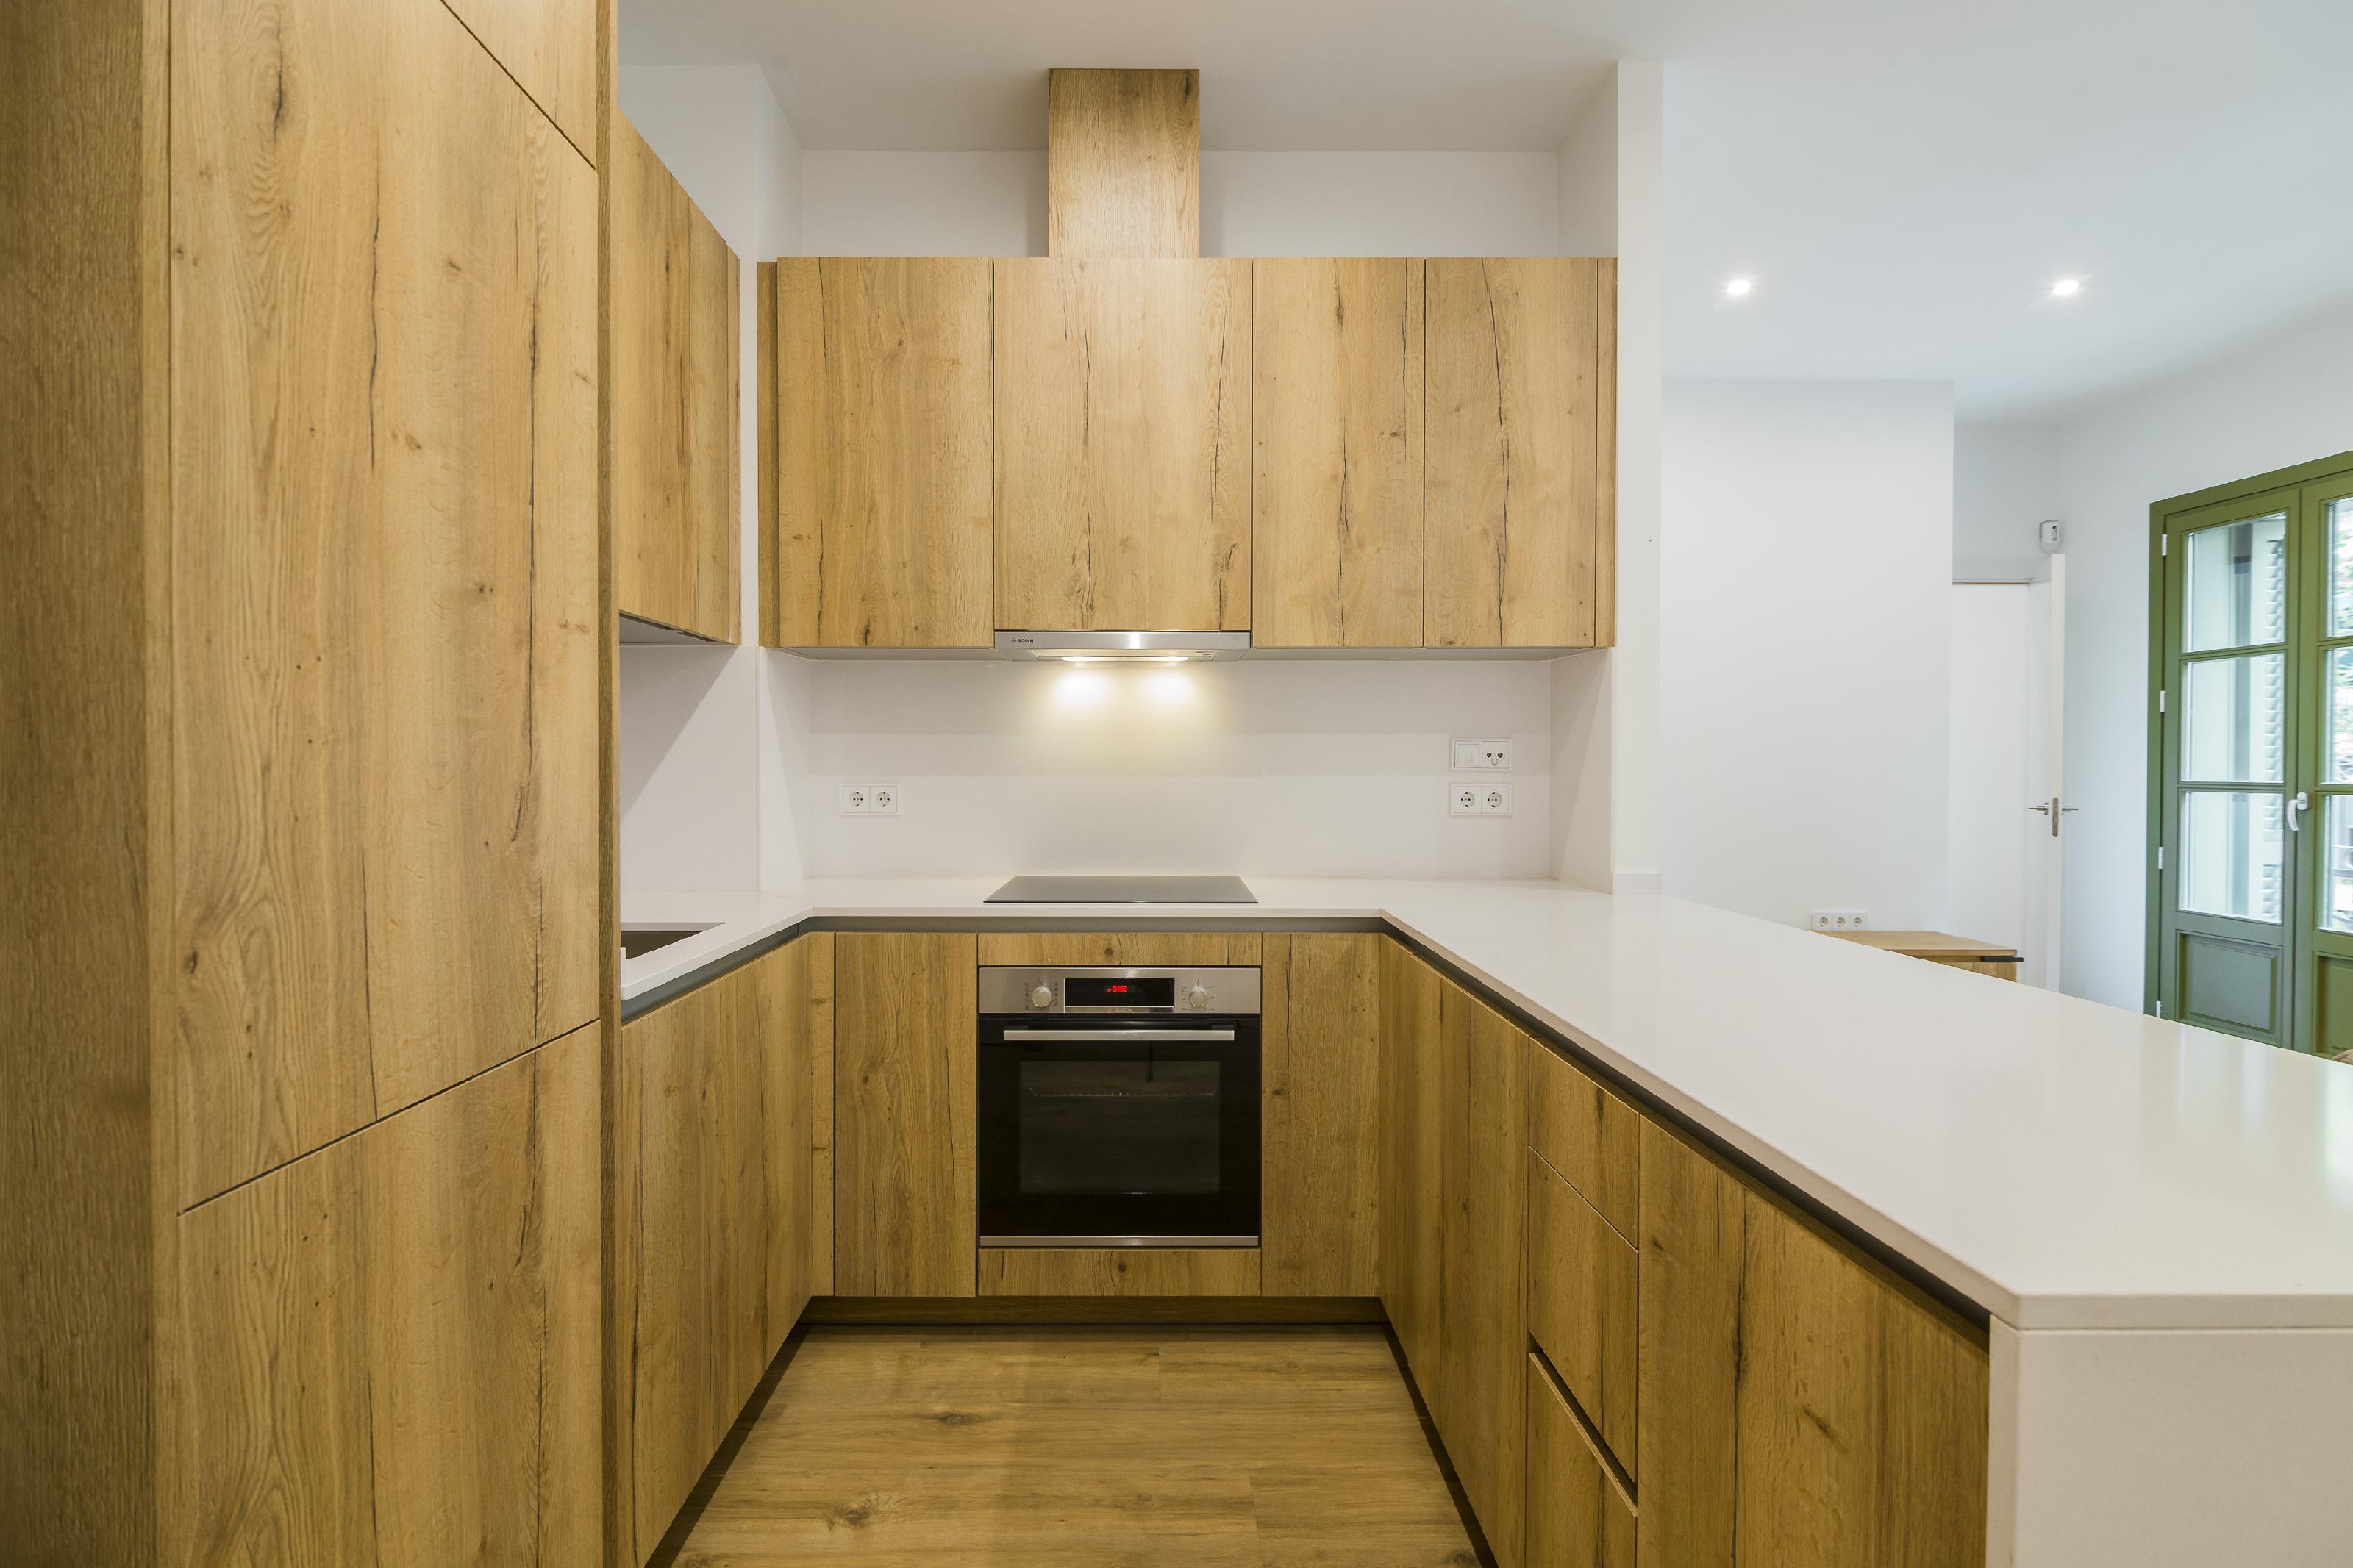 249860 Flat for sale in Eixample, Nova Esquerra Eixample 8